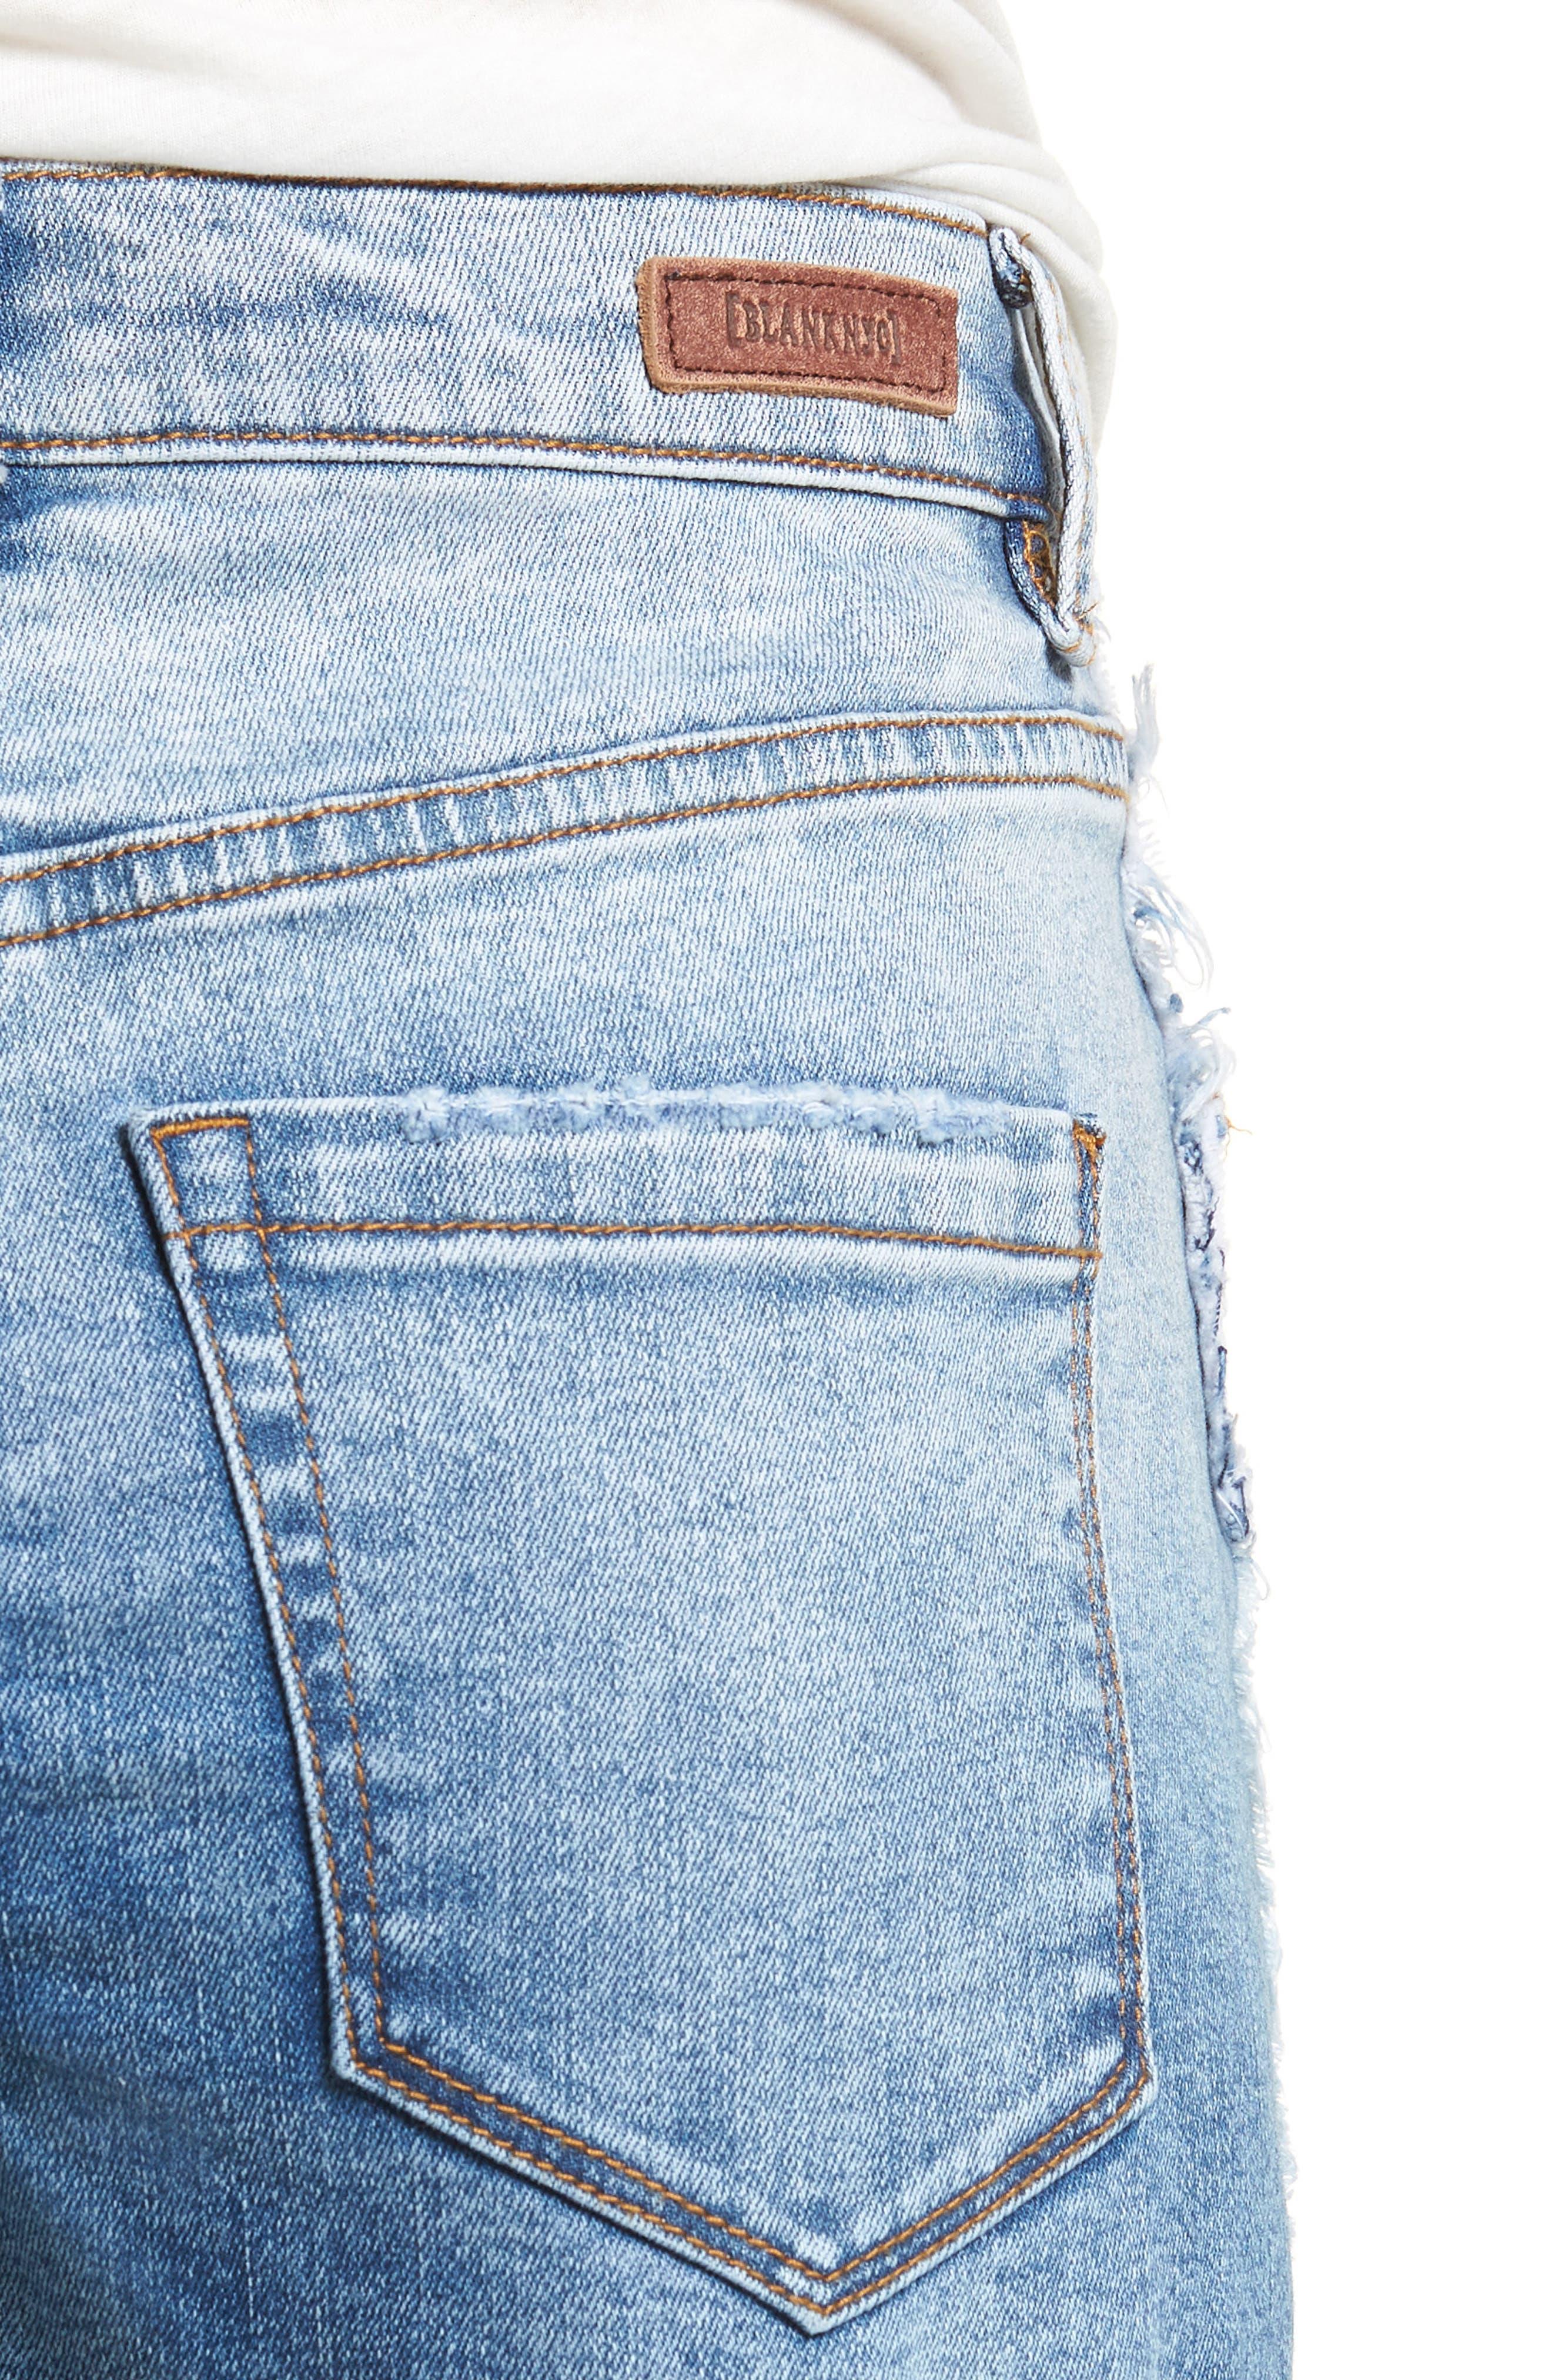 High Waist Cutoff Denim Shorts,                             Alternate thumbnail 4, color,                             400